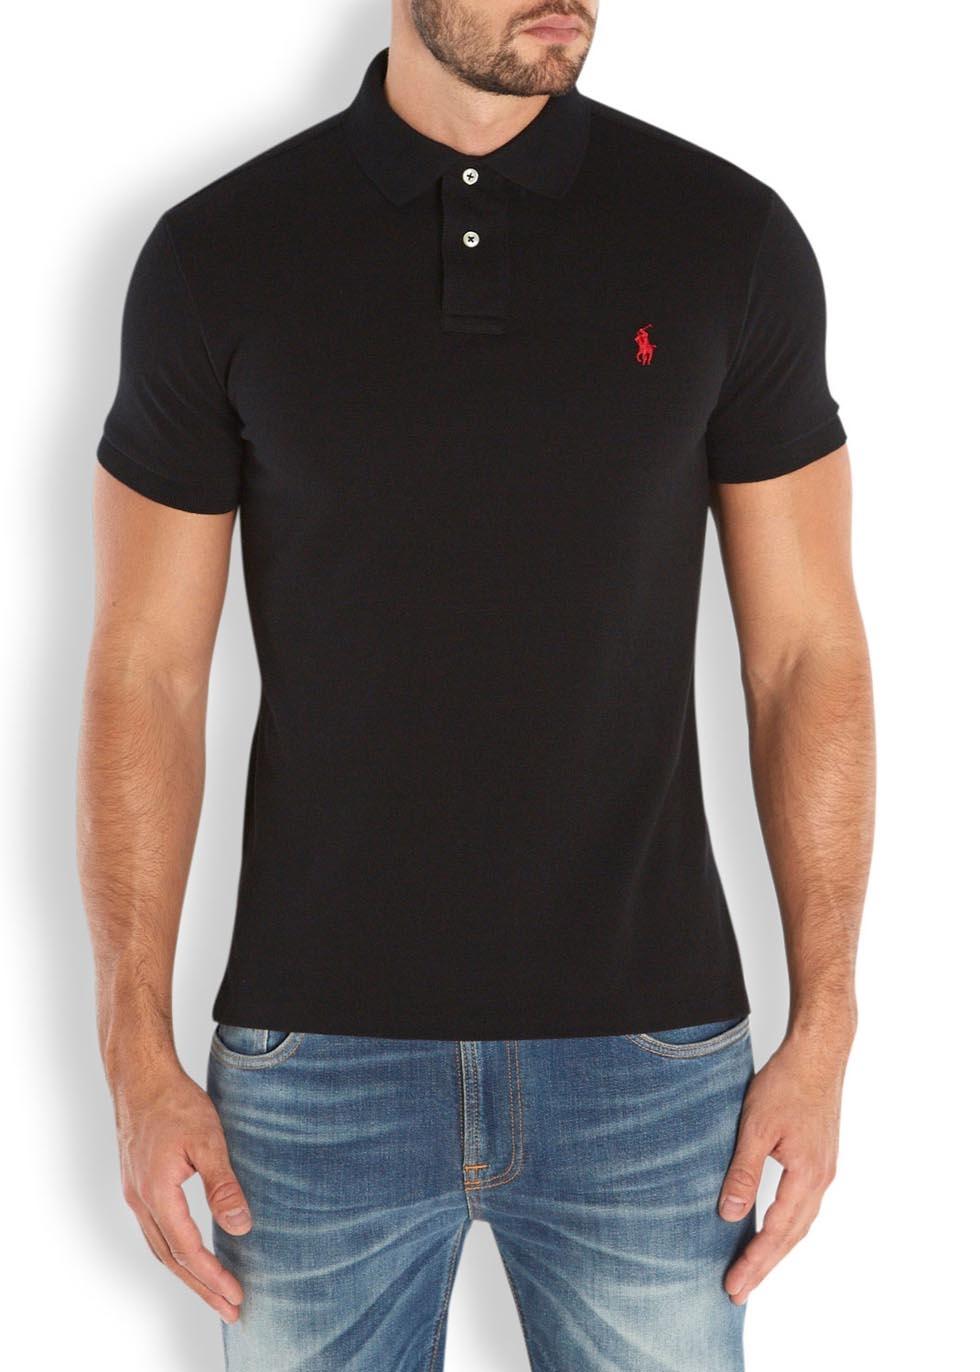 Polo ralph lauren black custom piqu cotton polo shirt in for Black cotton polo shirt